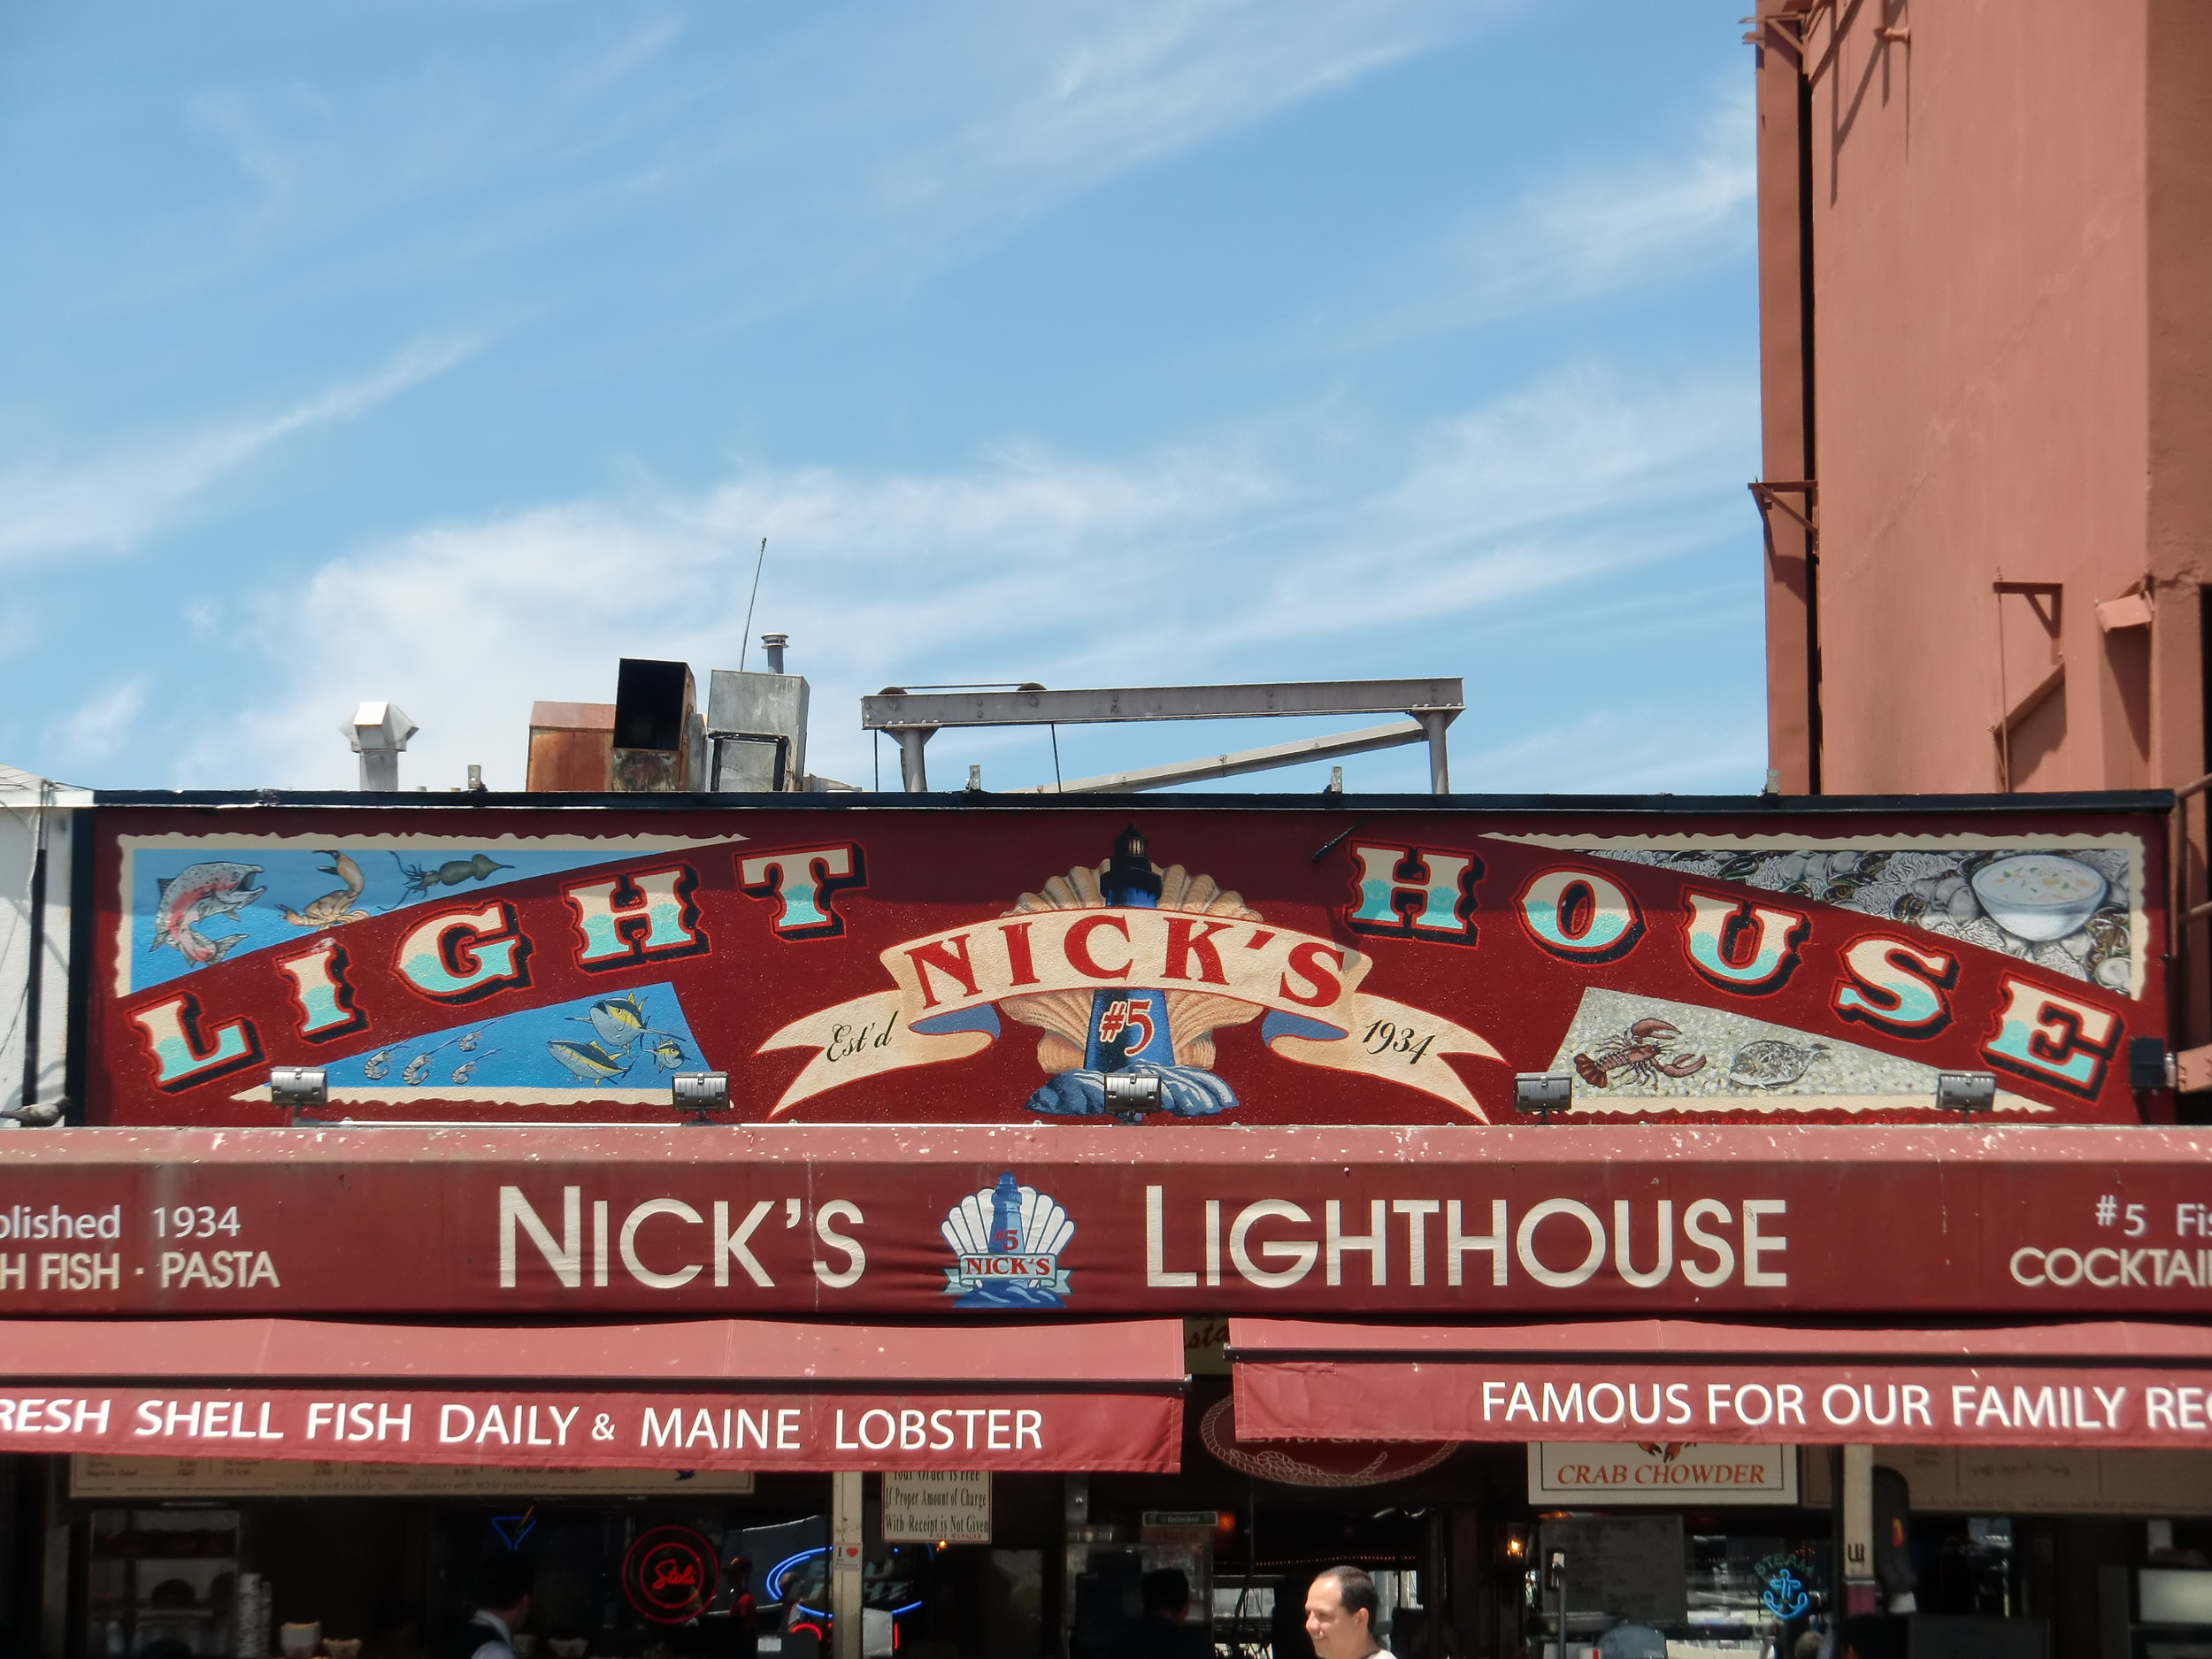 ORIG-nicks-lighthouse_4746993493_o.jpg